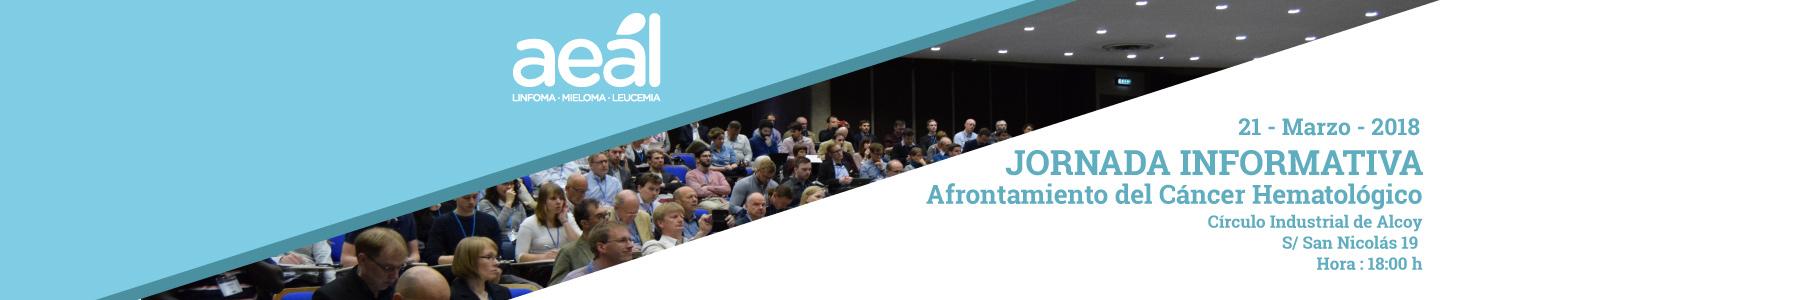 banner-JORNADA-ALCOY